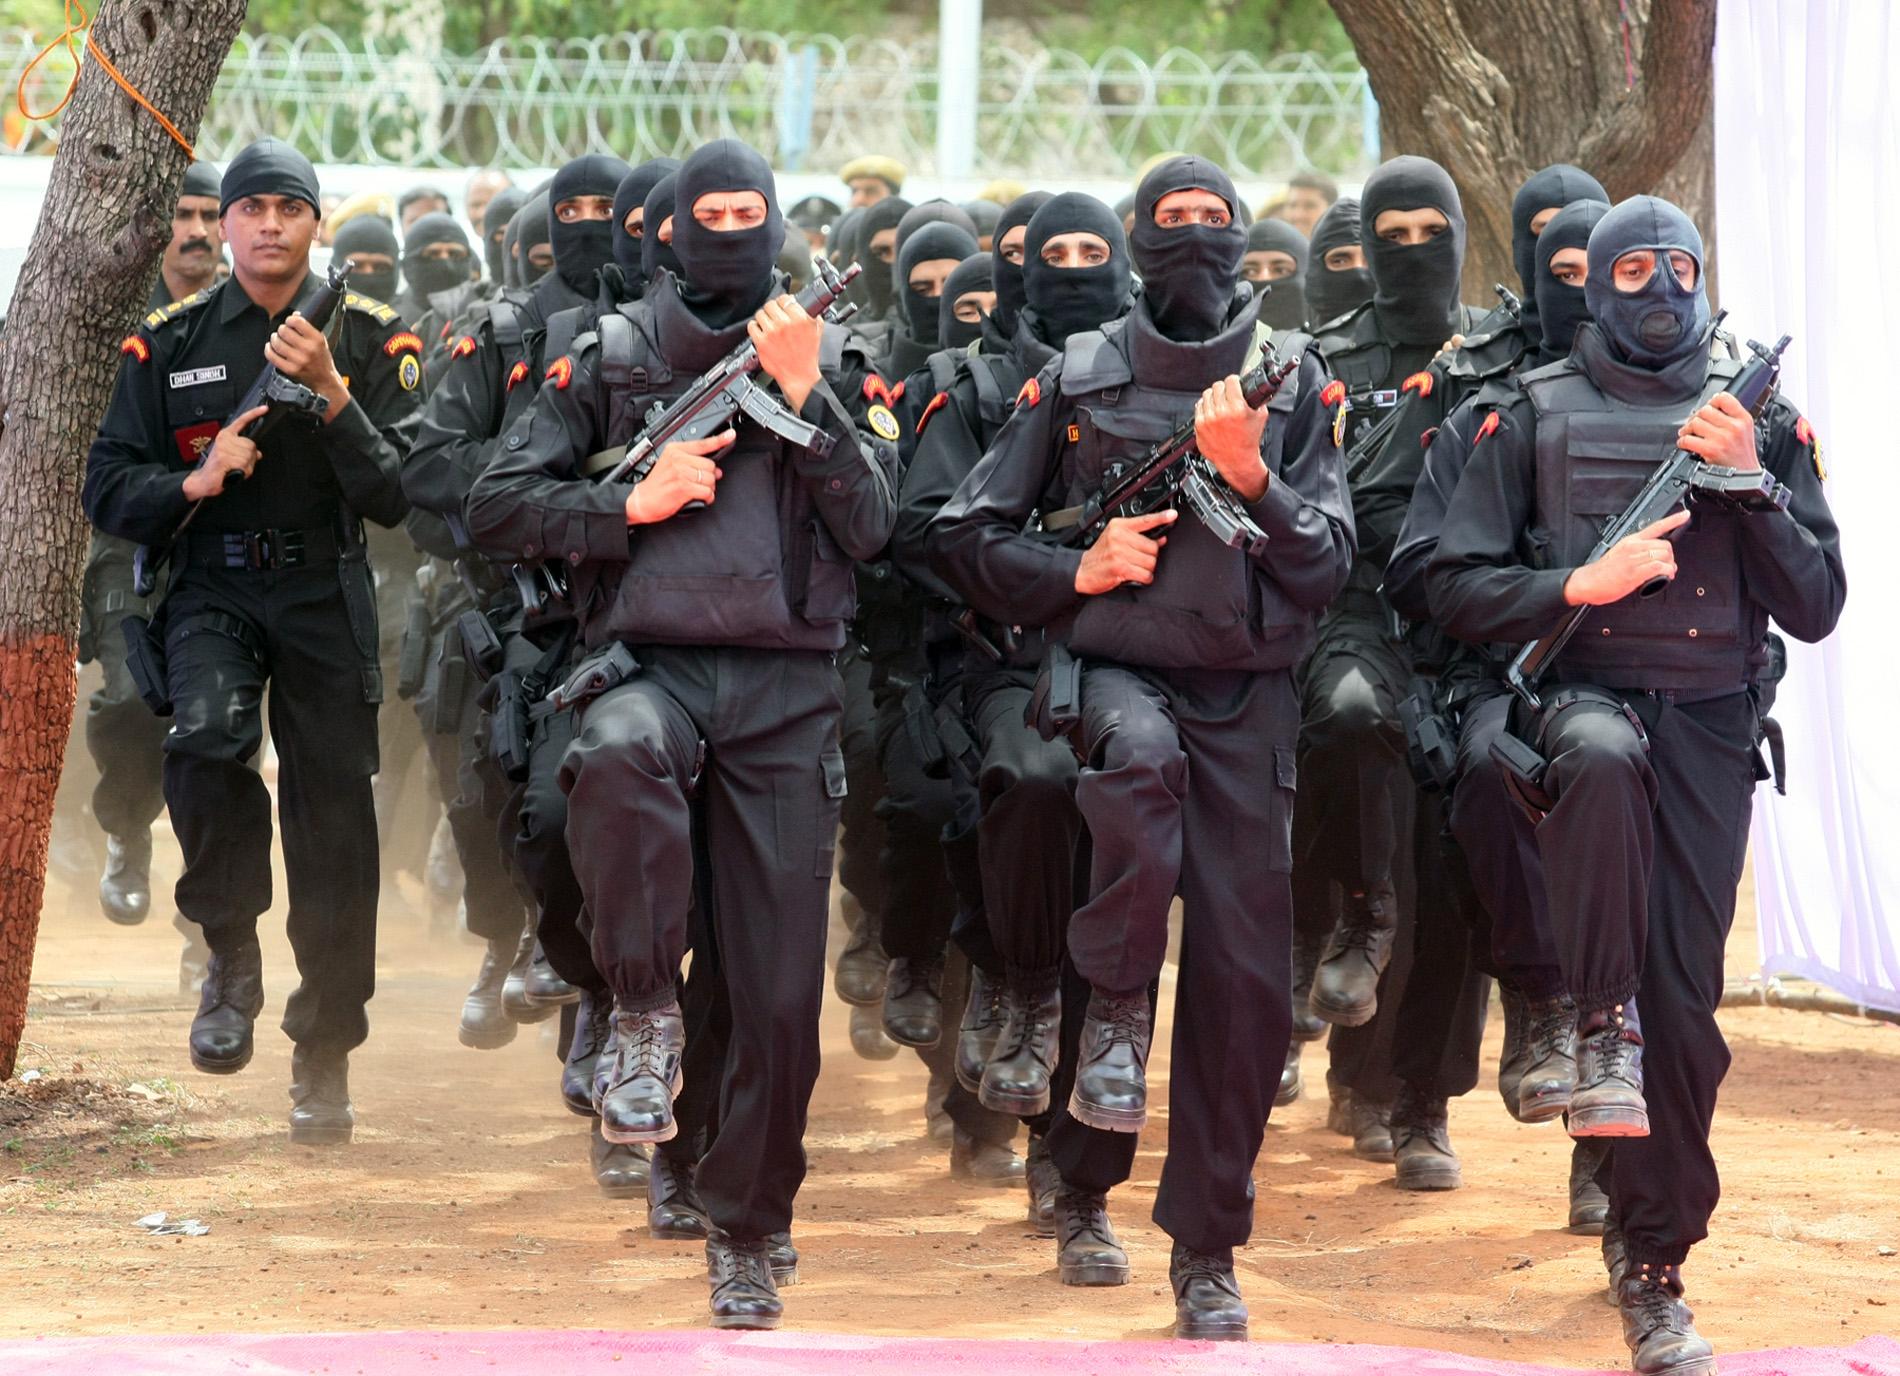 NSG commandos at the inauguration of the 'NSG Hub' at Bowenpally in Hyderabad on July 1, 2009.